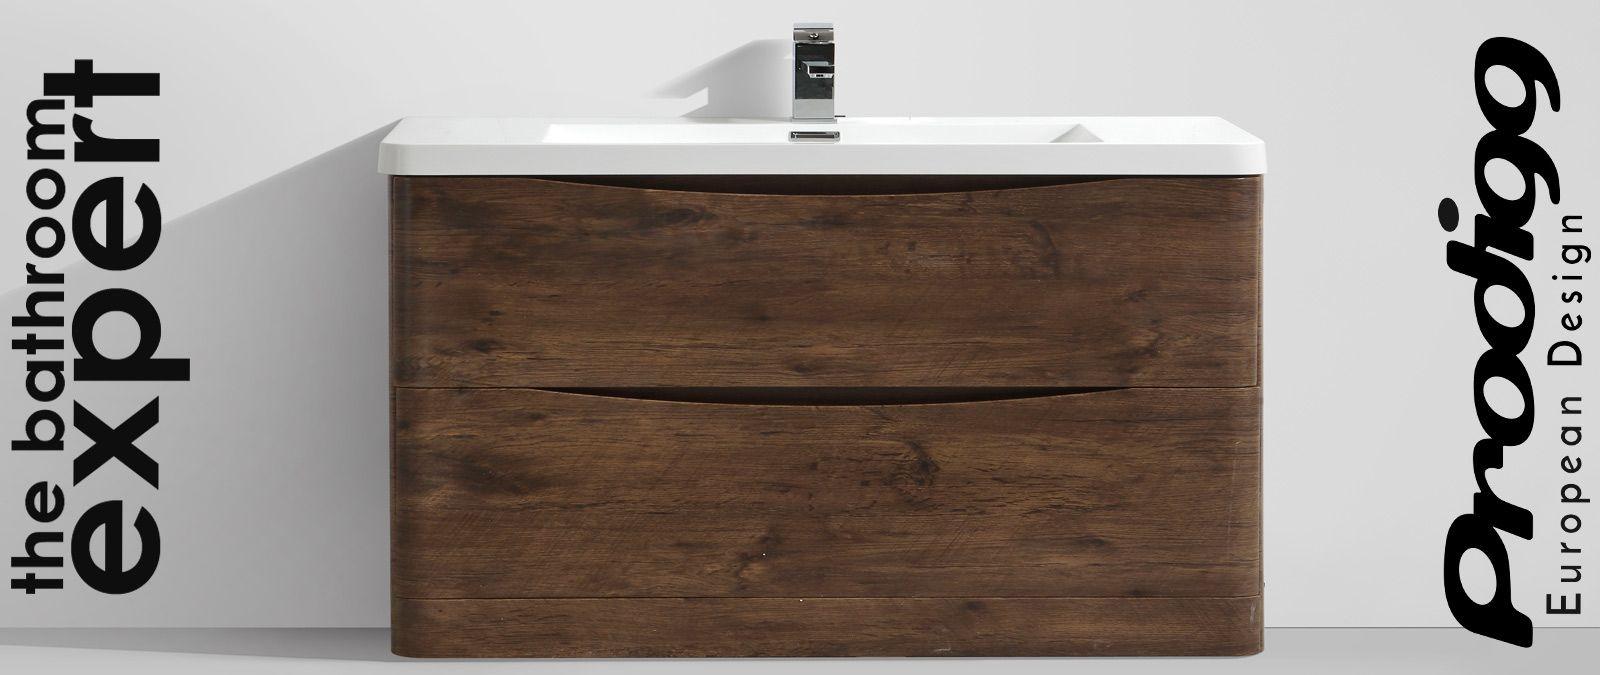 Smile - Bathroom Free Standing Vanity 120cm by Prodigg®